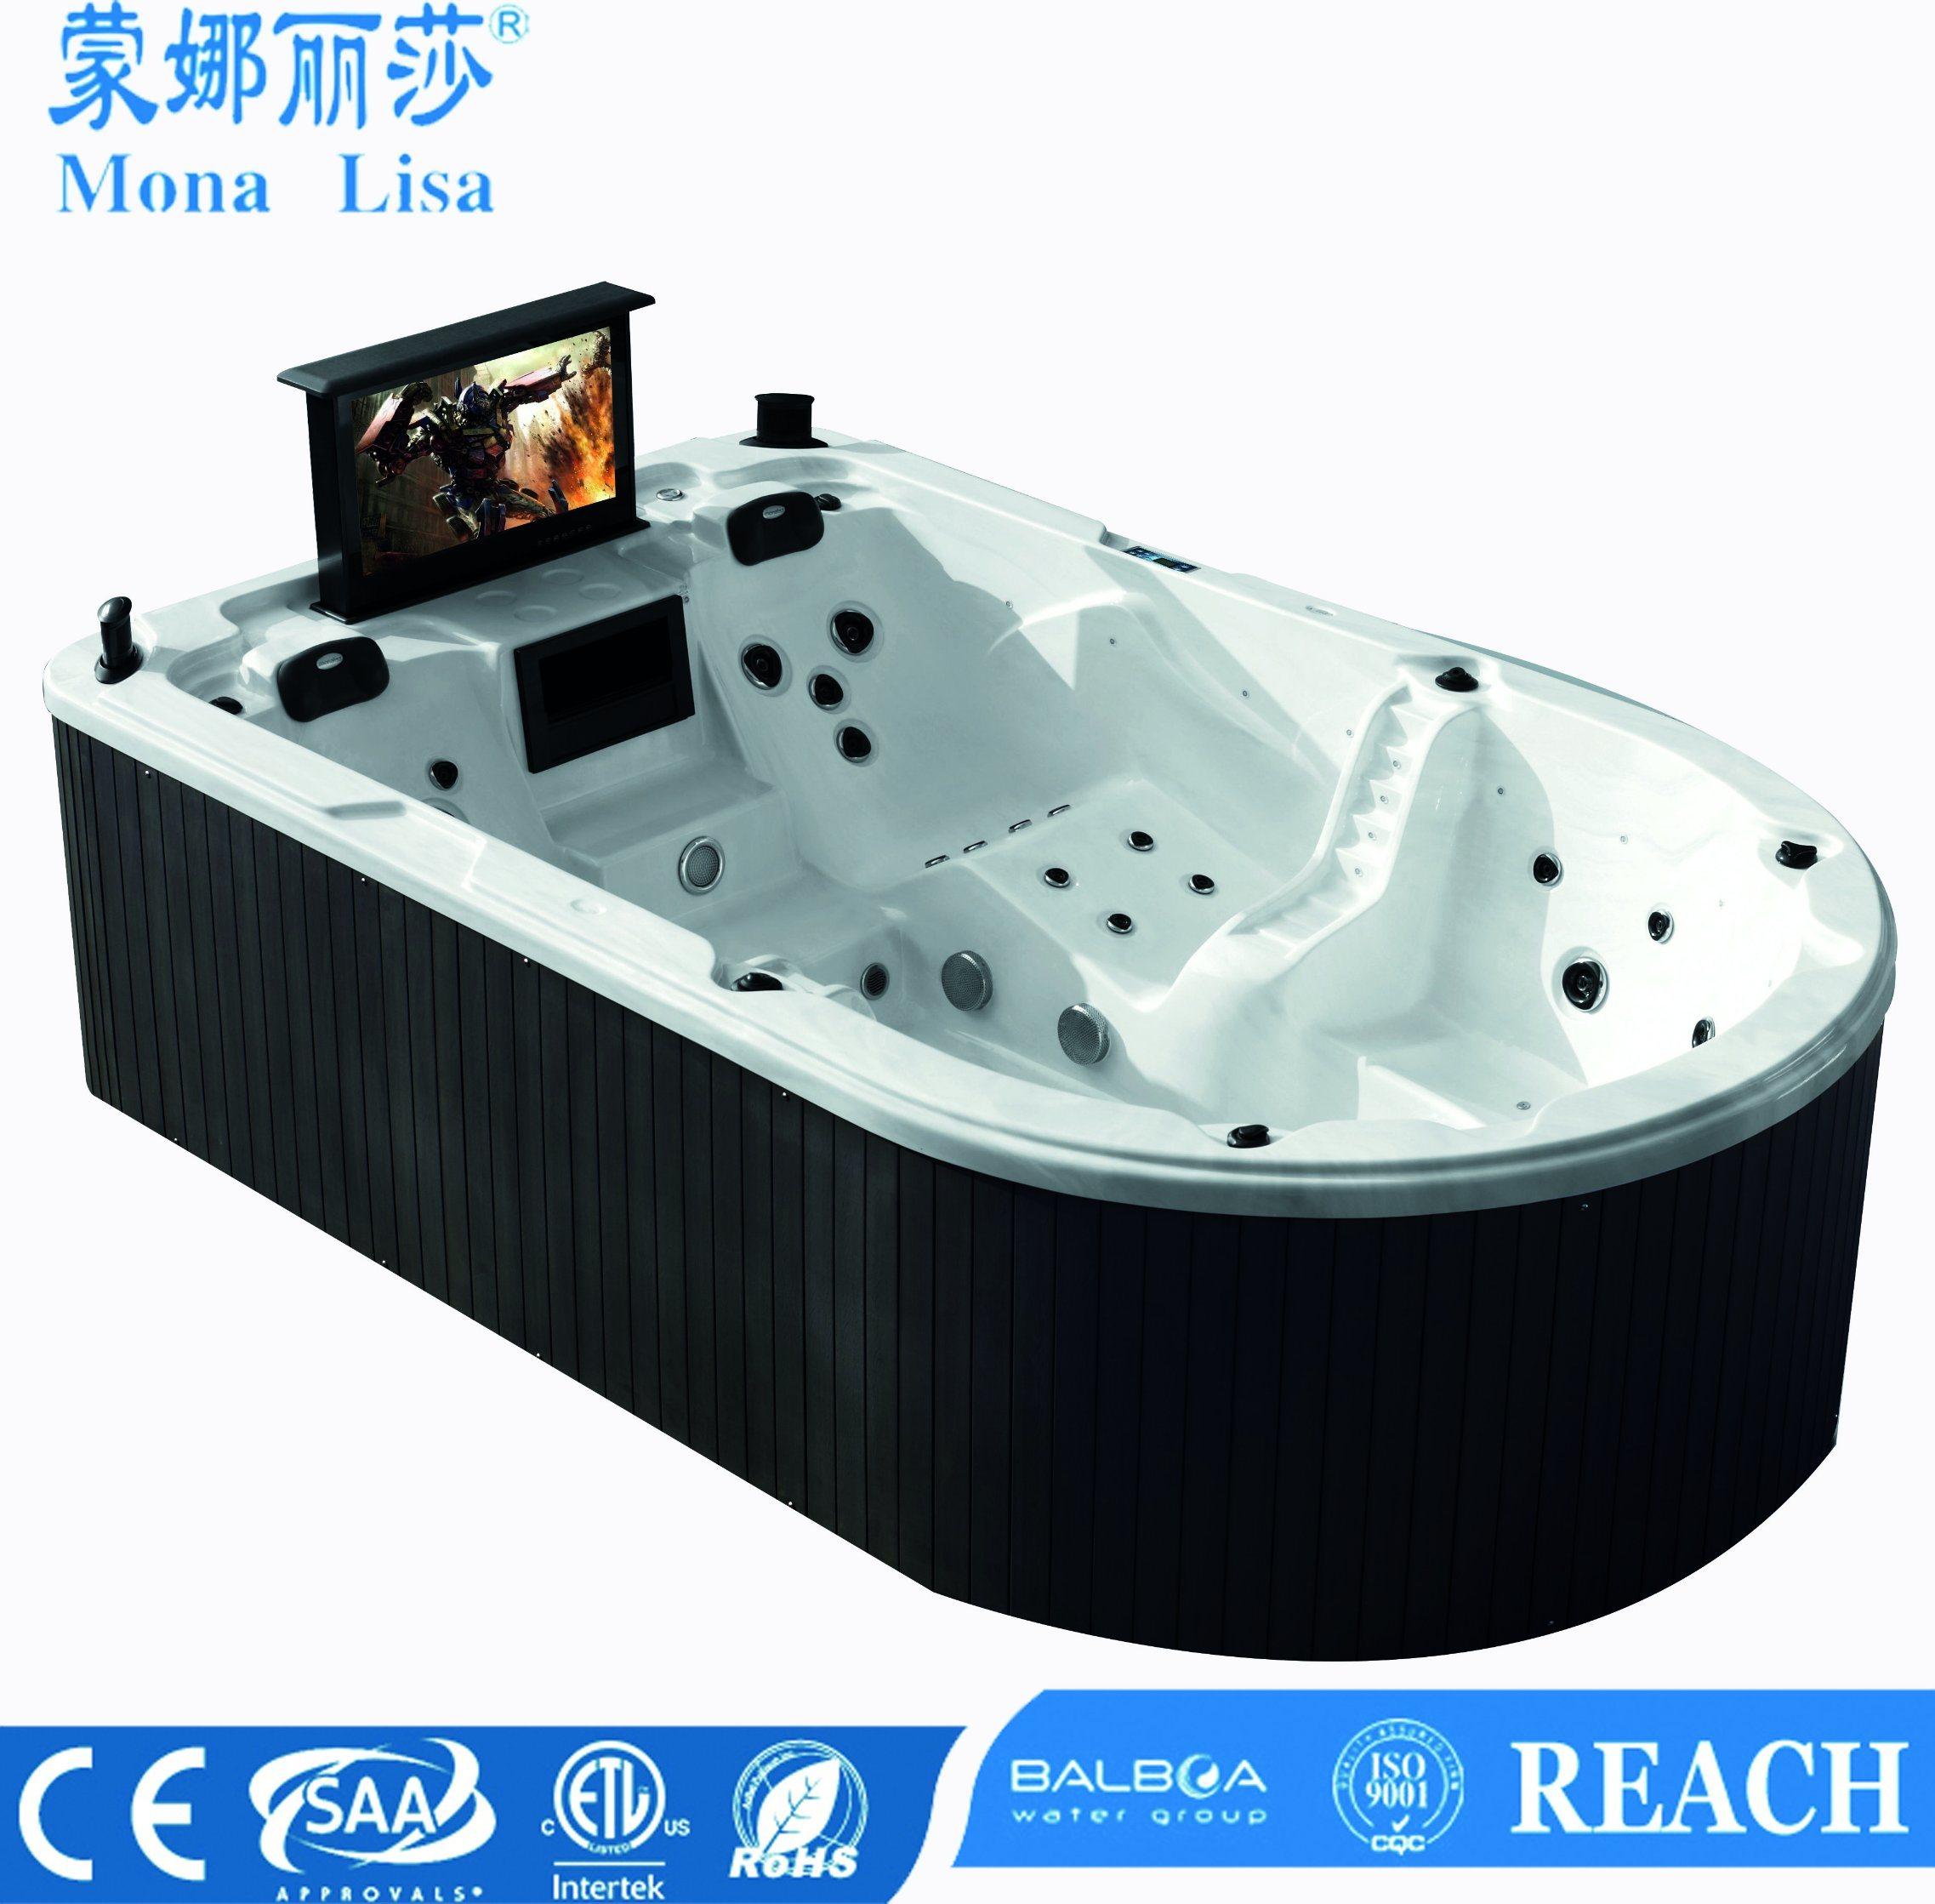 and spa image traditional profile reviews spas coast hot series tubs tub